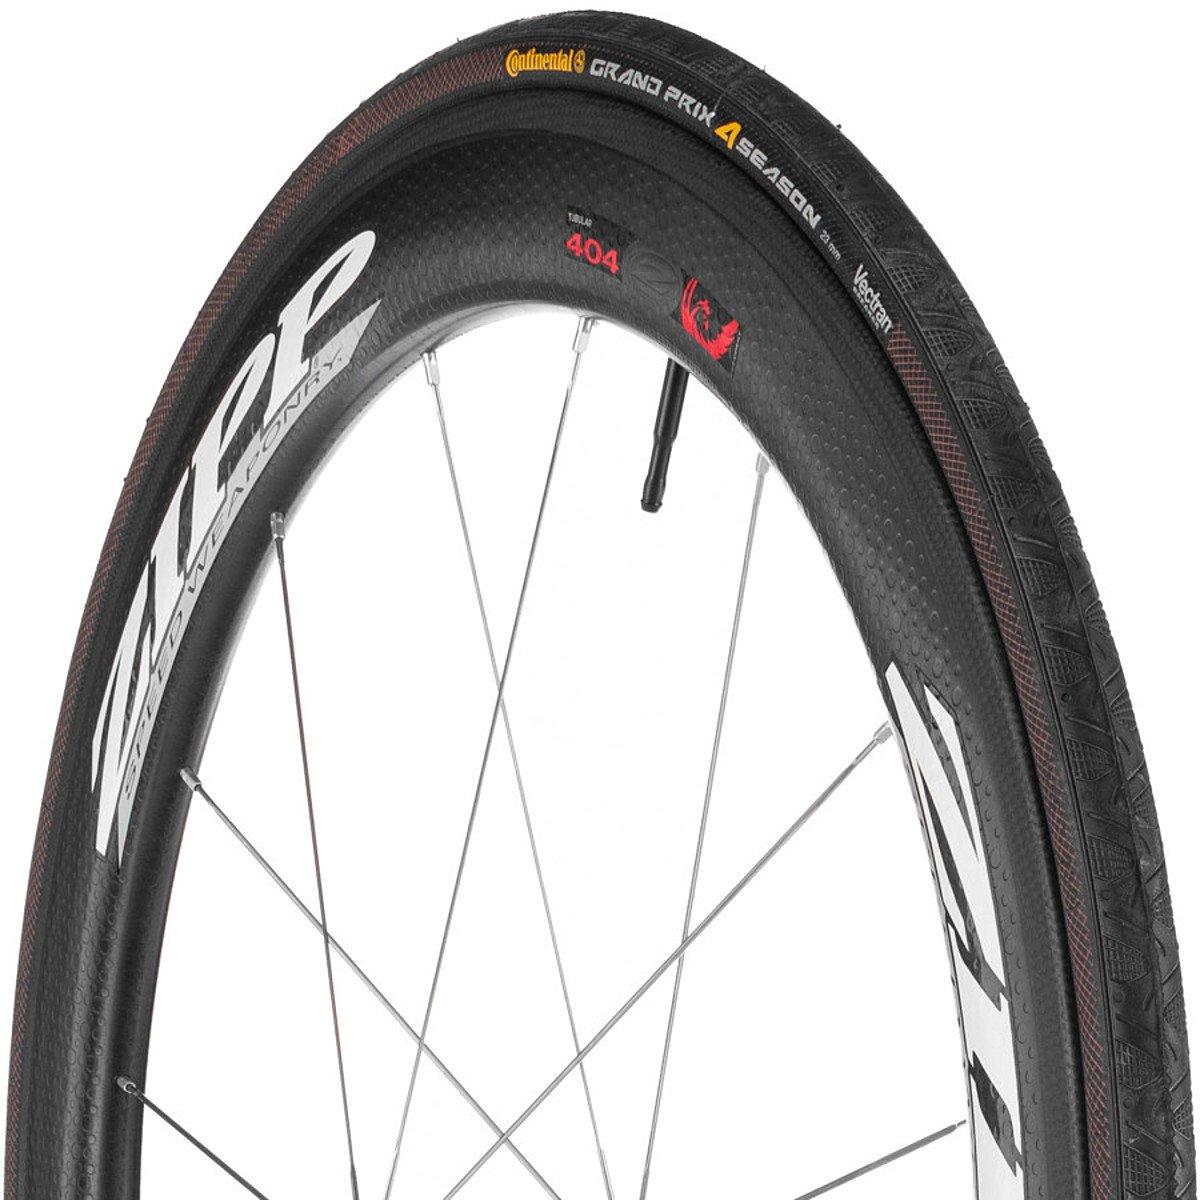 Continental Grand Prix 4 Season Tire Clincher Black-Duraskin 700c x 28mm